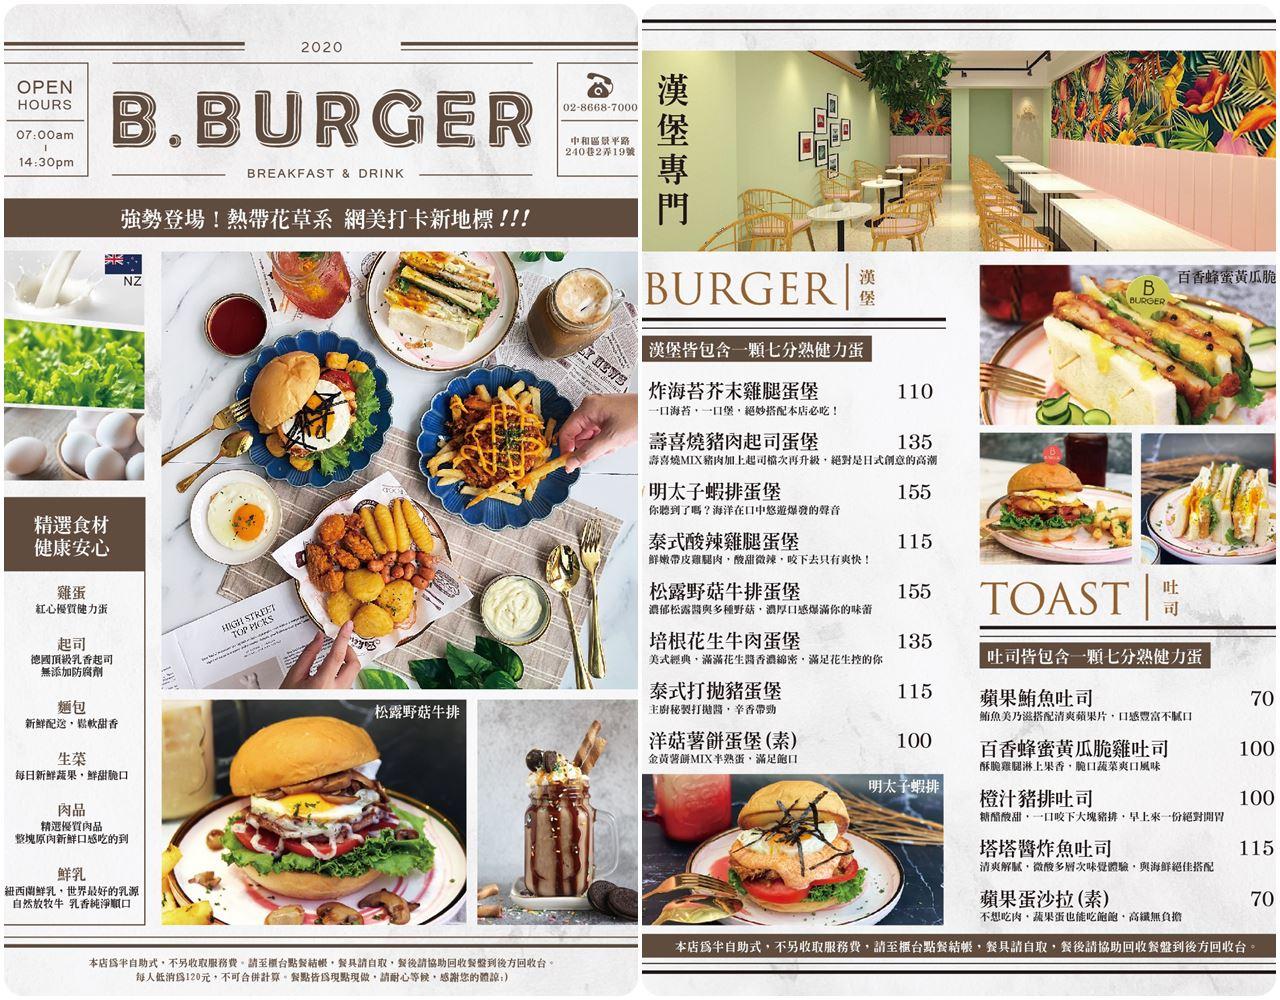 B.burger 嗶嗶漢堡-菜單